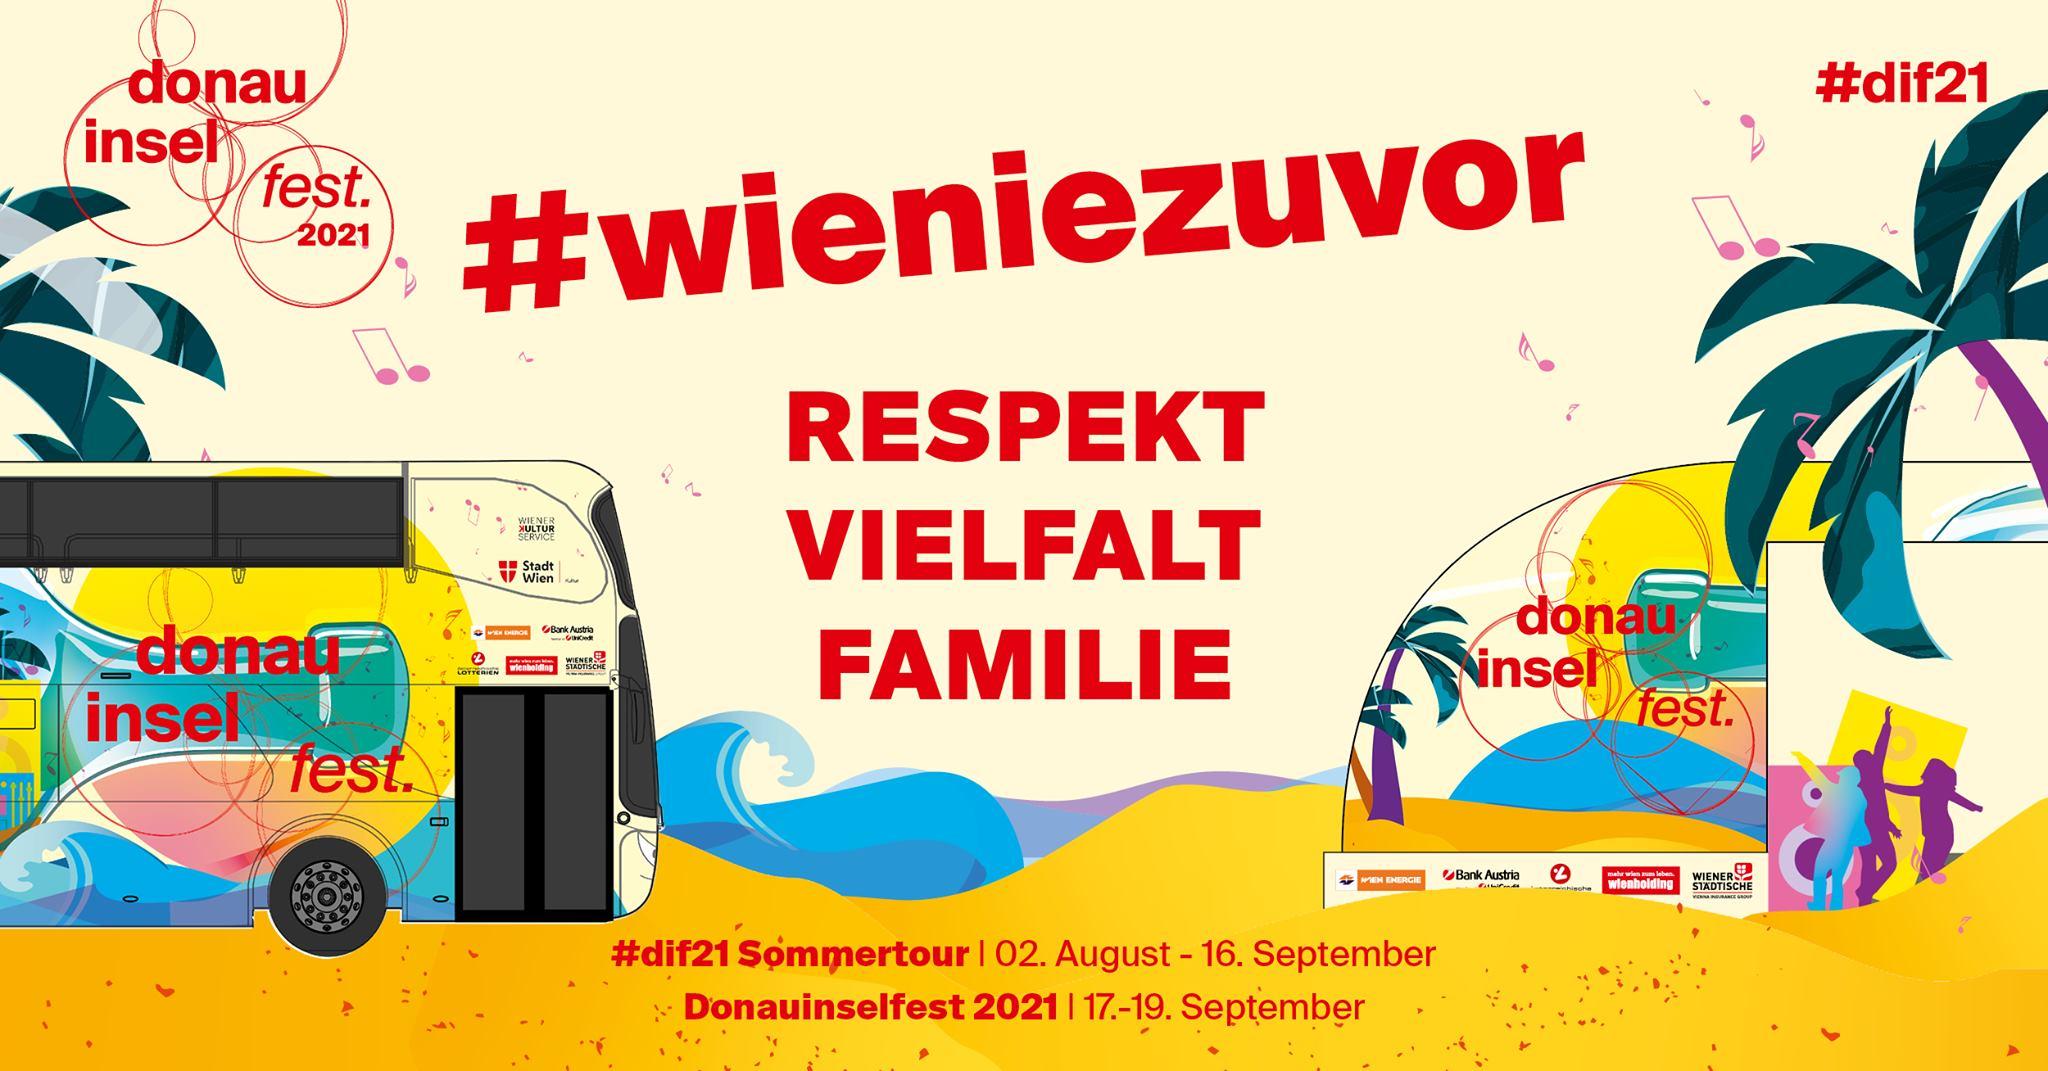 Events Wien: Donauinselfest 2021